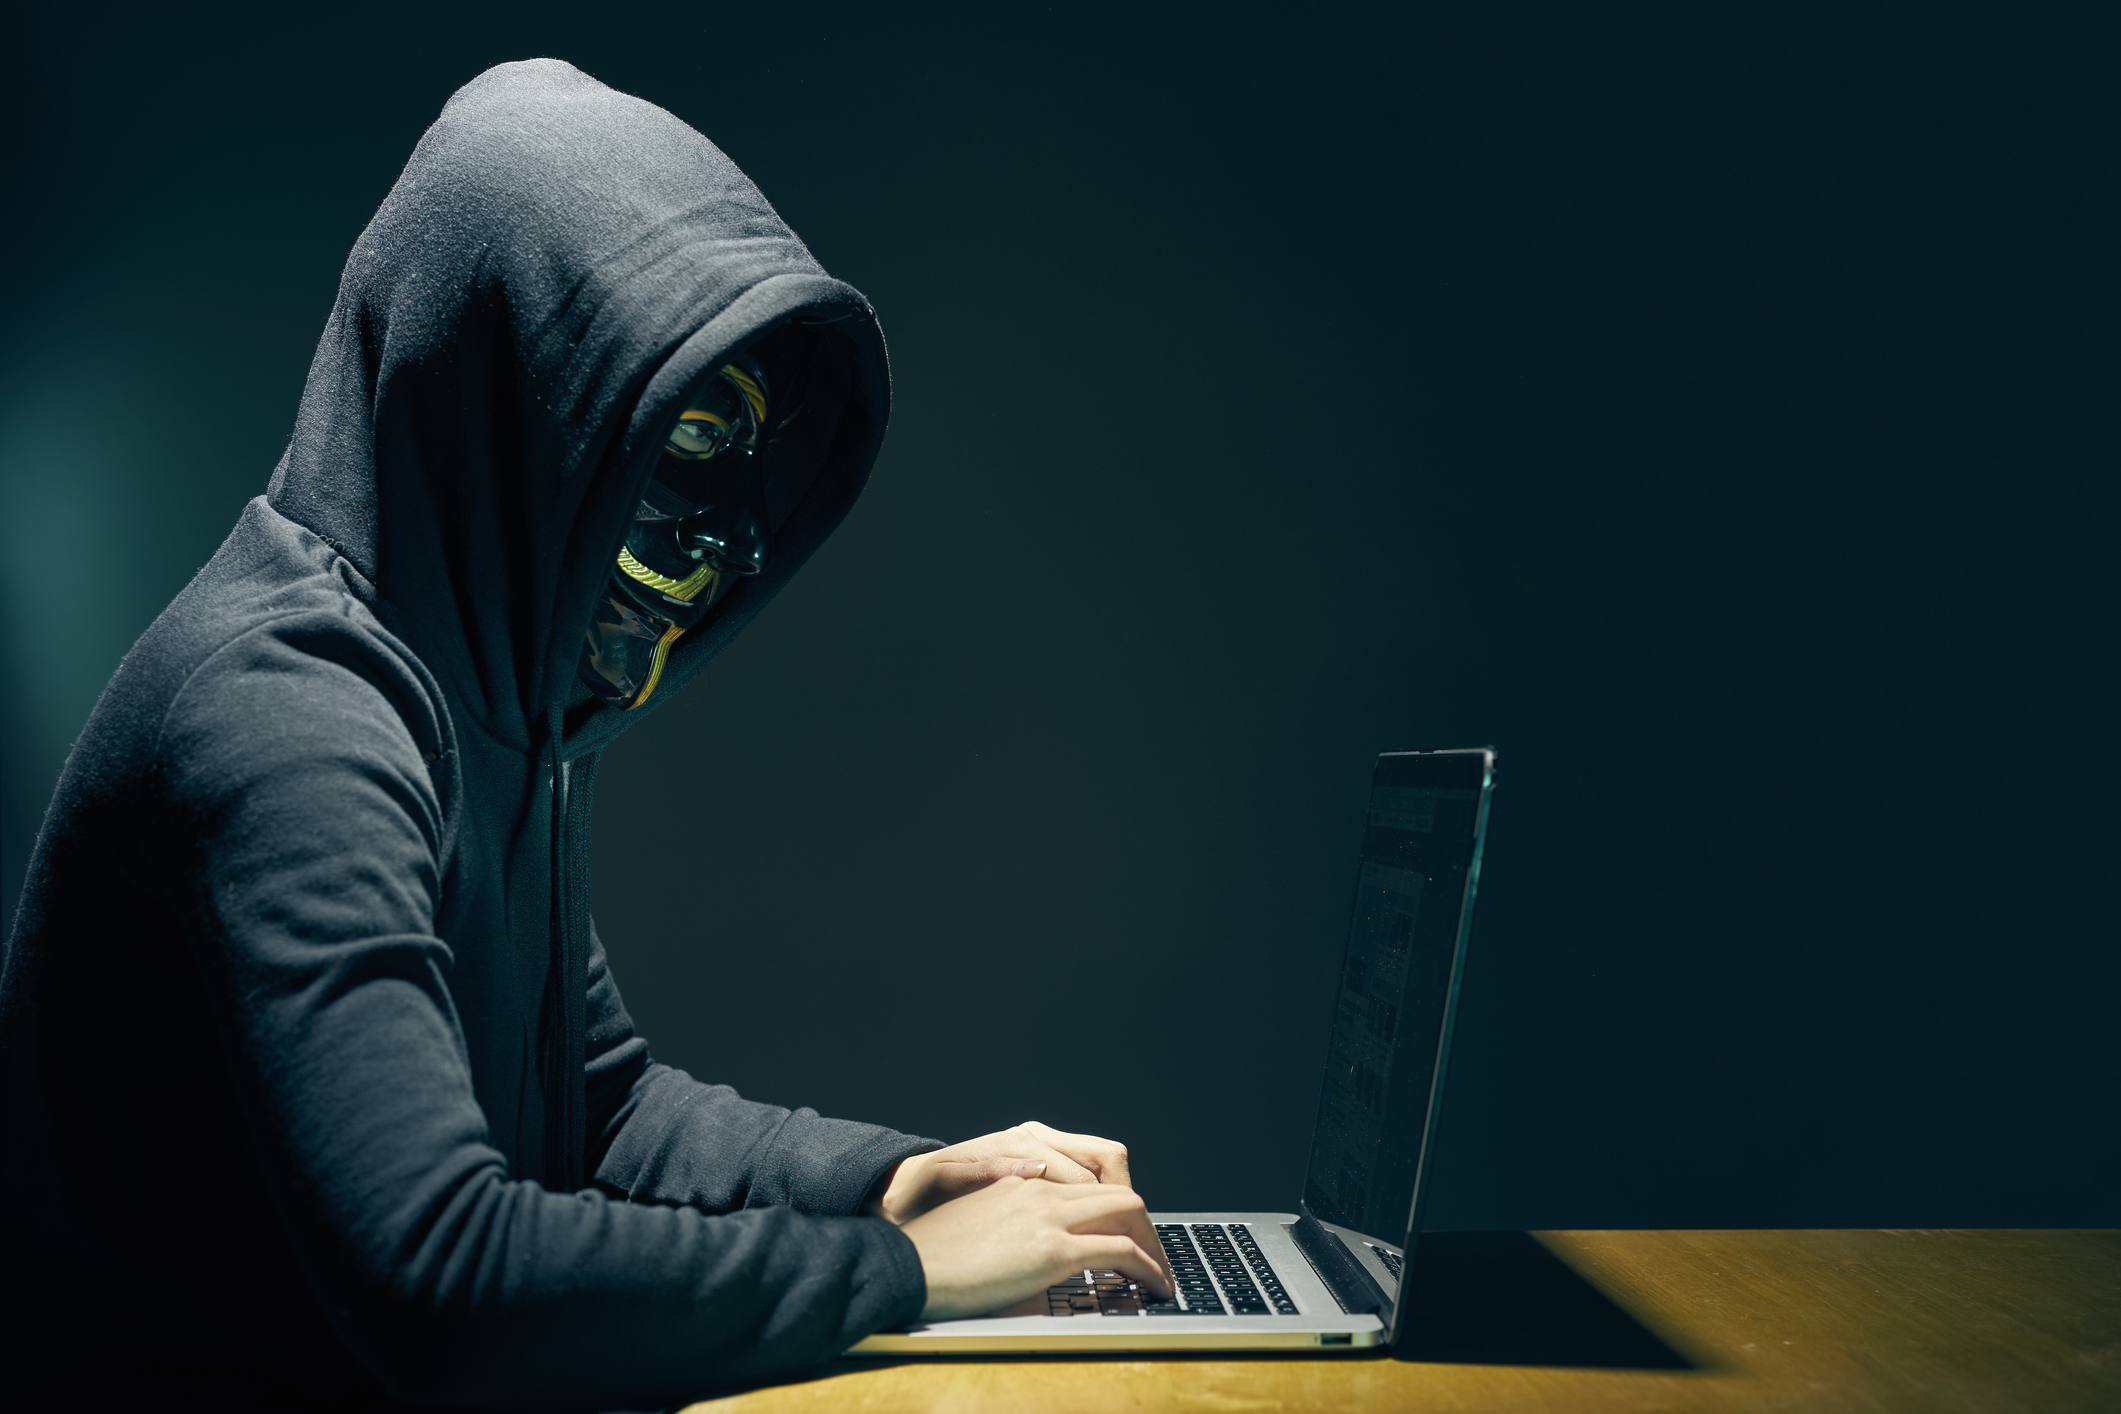 45c471eecd8  Black hat hacker    criminal with evil intent